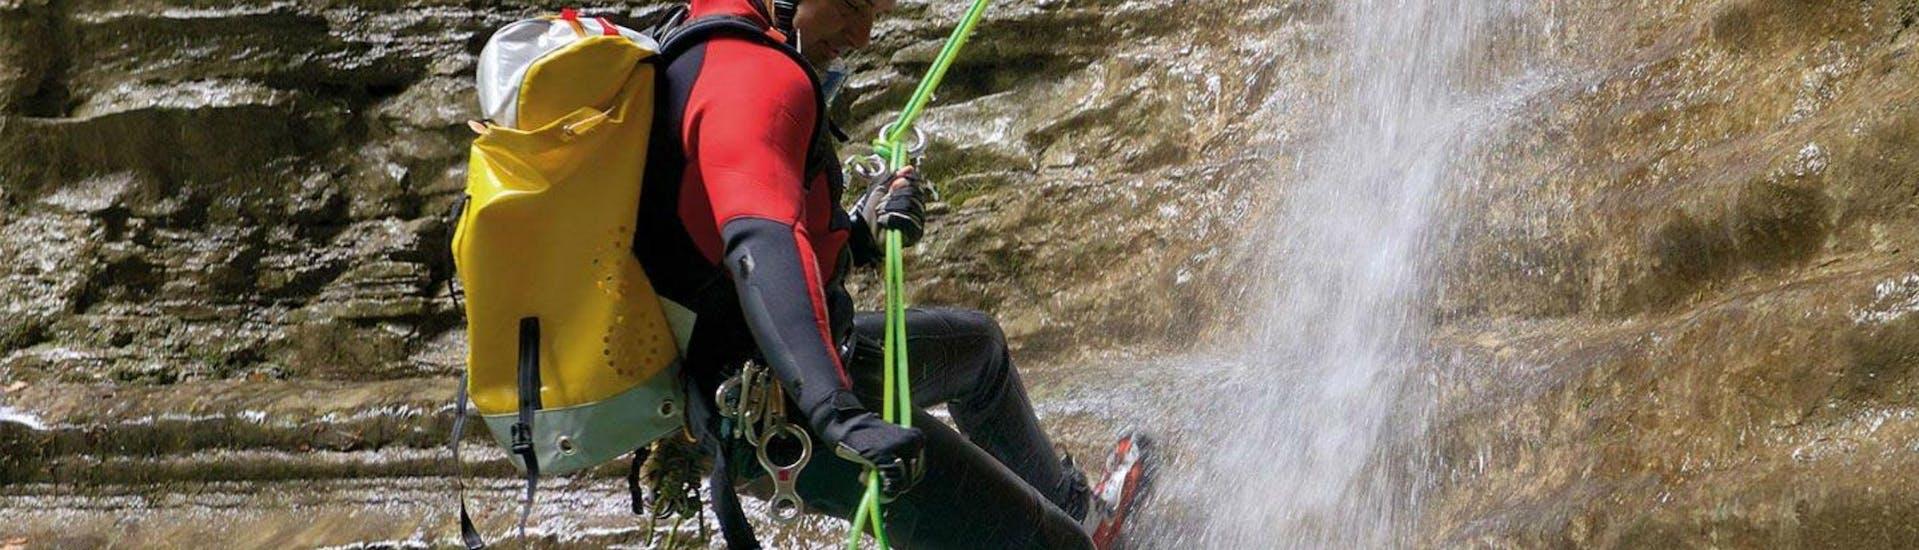 Canyoning for Adventurers - Wunzenschlucht